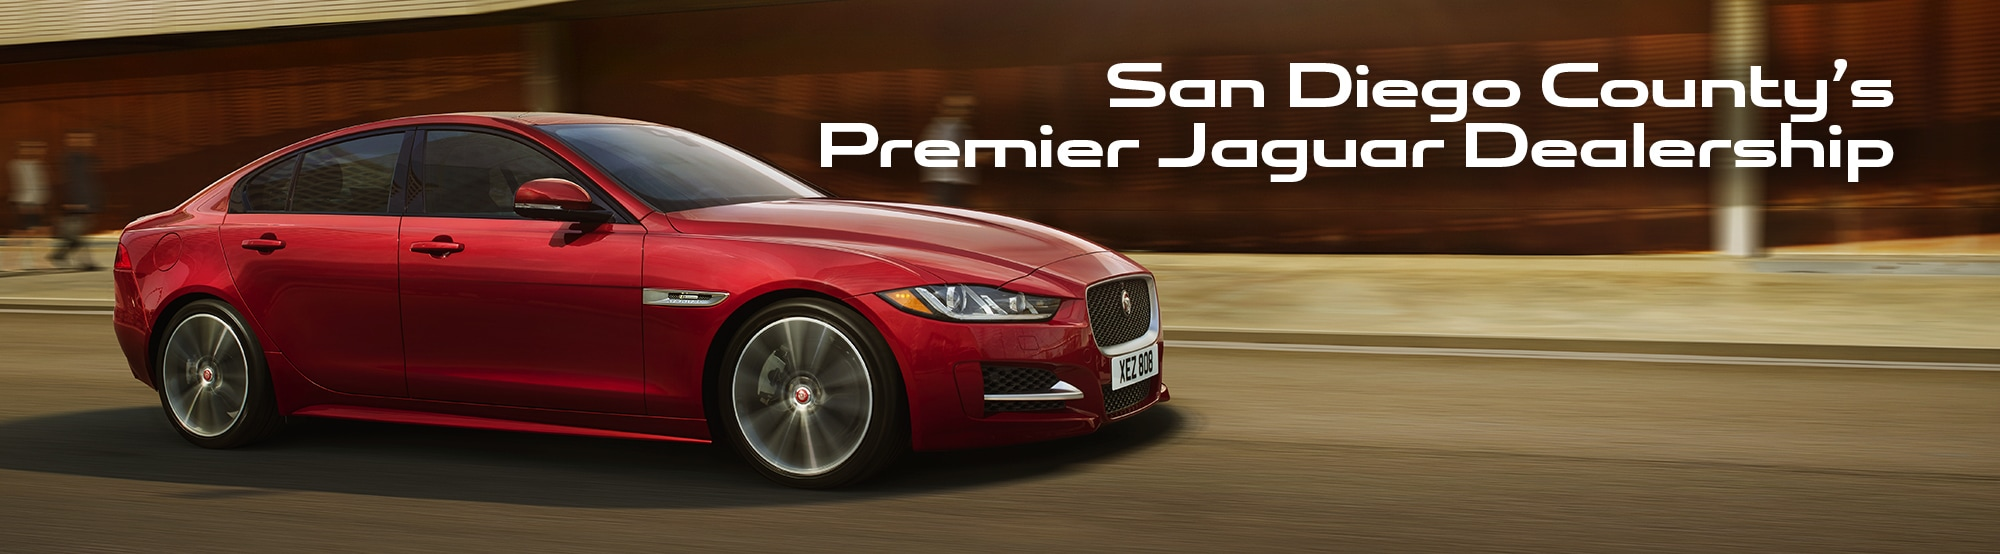 xe awesome htm premium cincinnati all dealers new door dealership me pace dealer in nj sedan e of jaguar first near